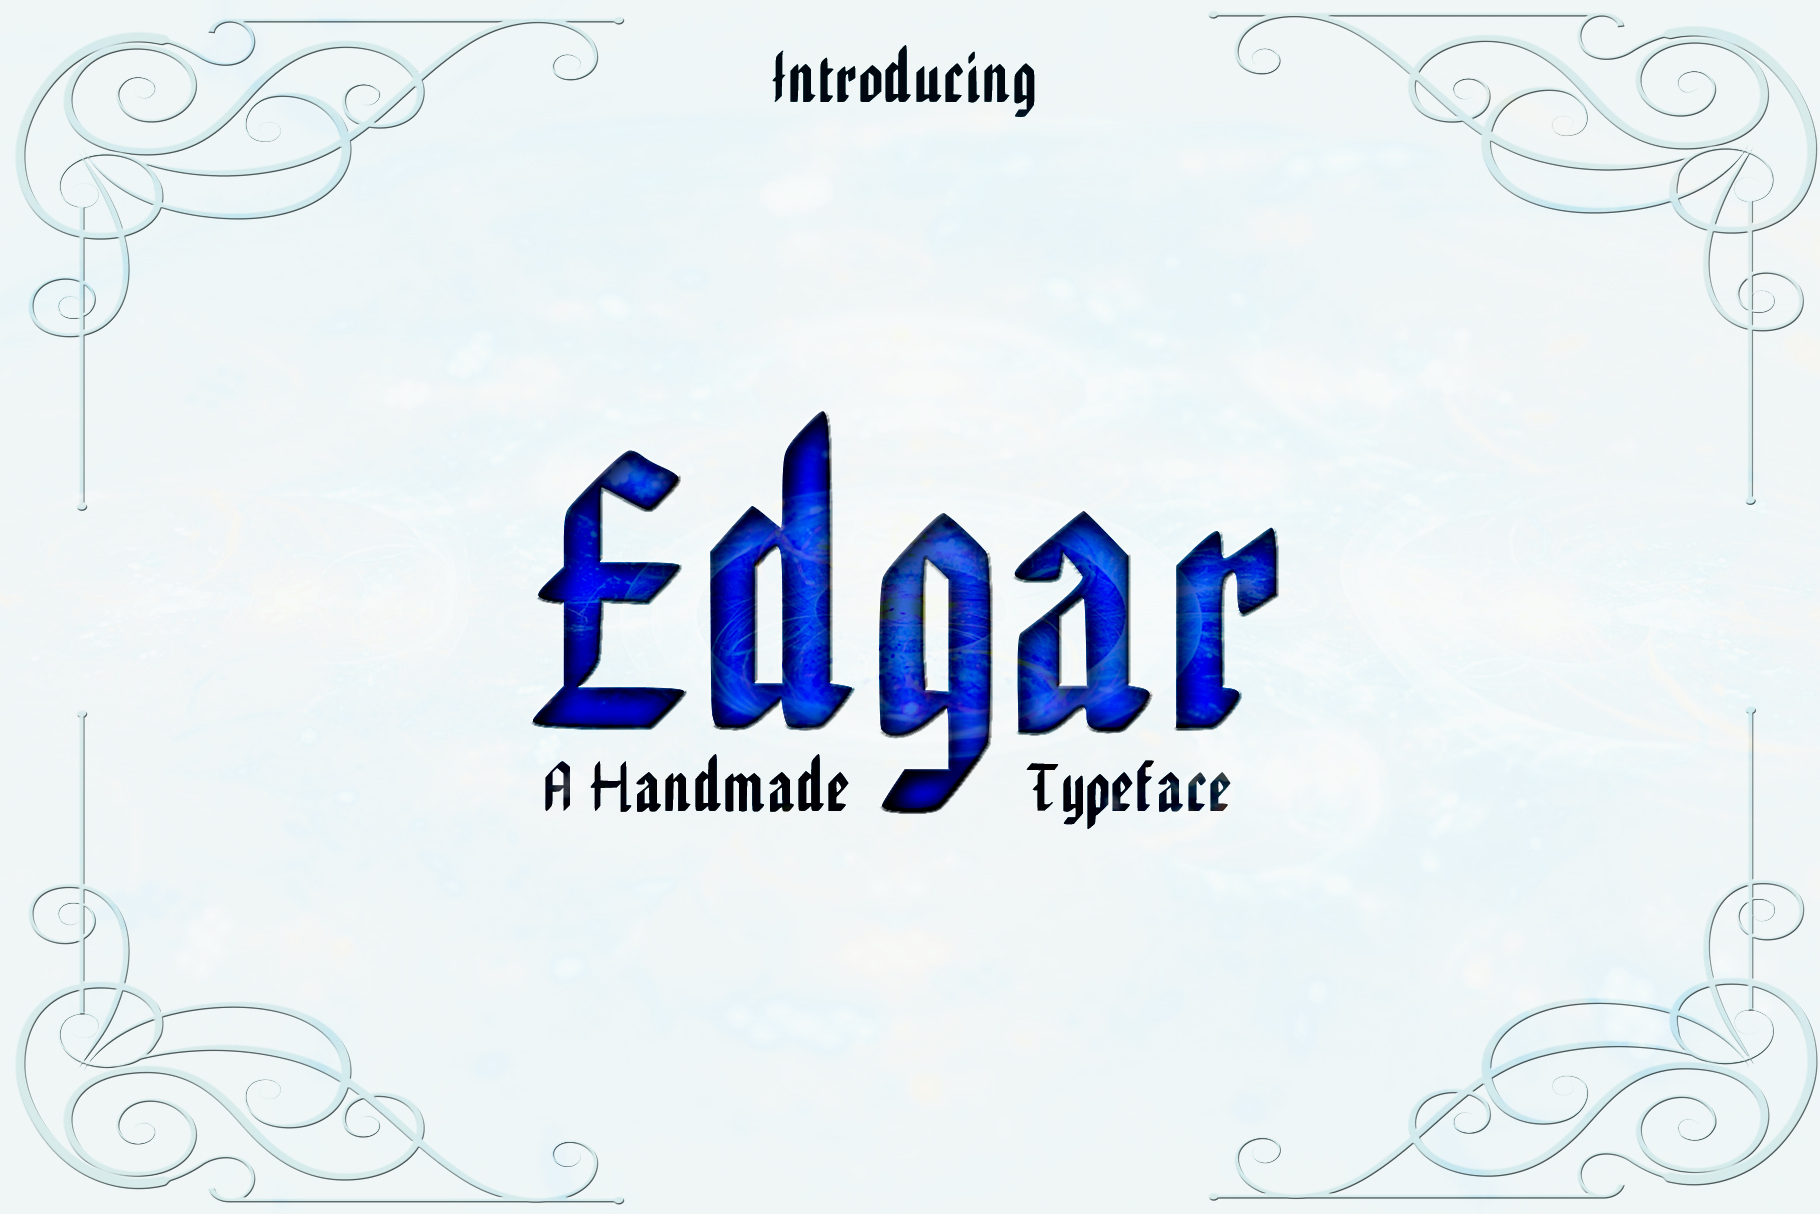 EDGAR, Handmade Gothic Typeface example image 1